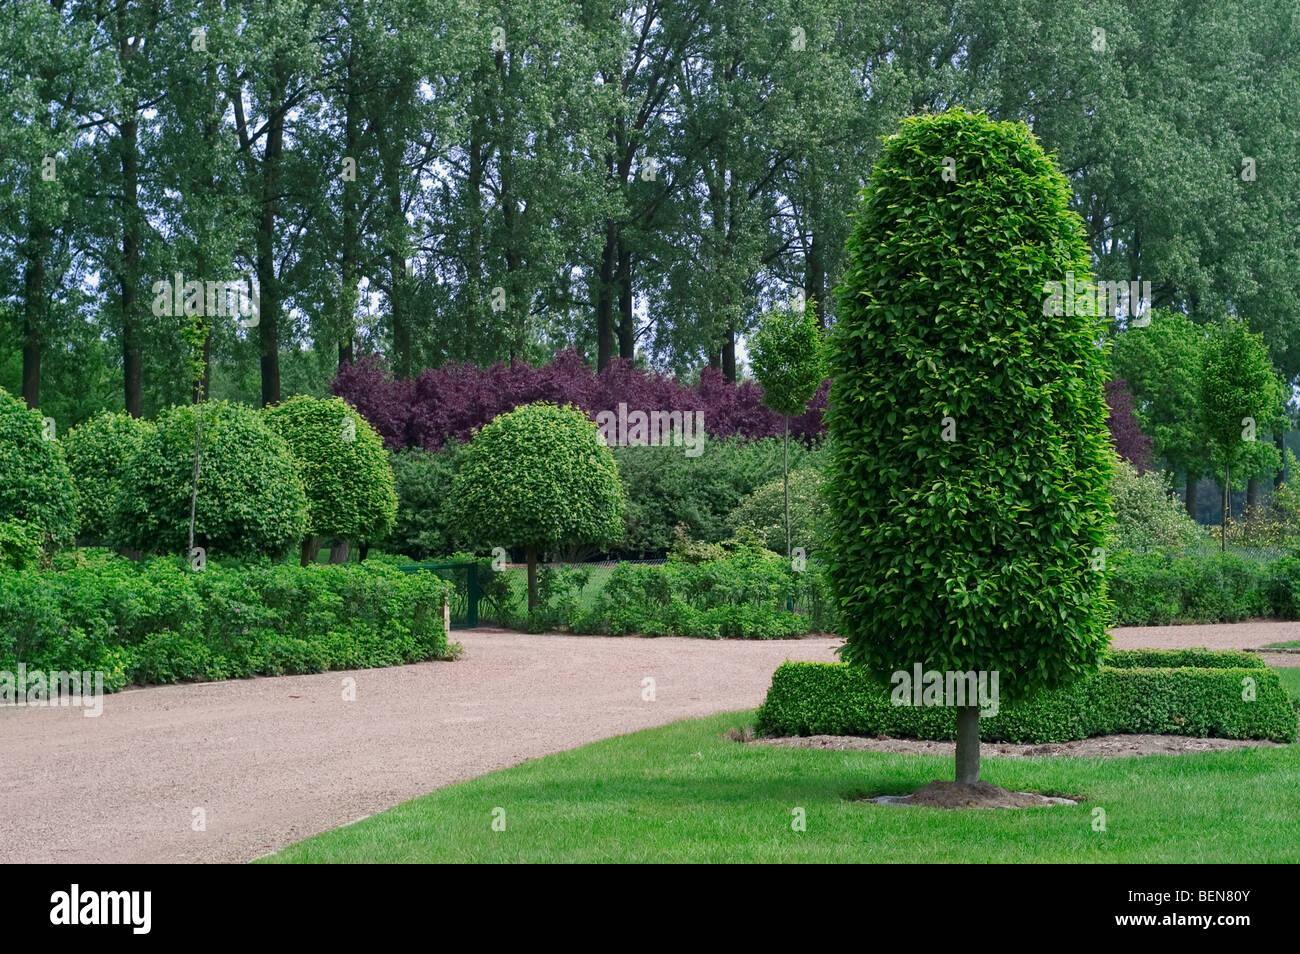 Trimmed trees in park, Belgium - Stock Image